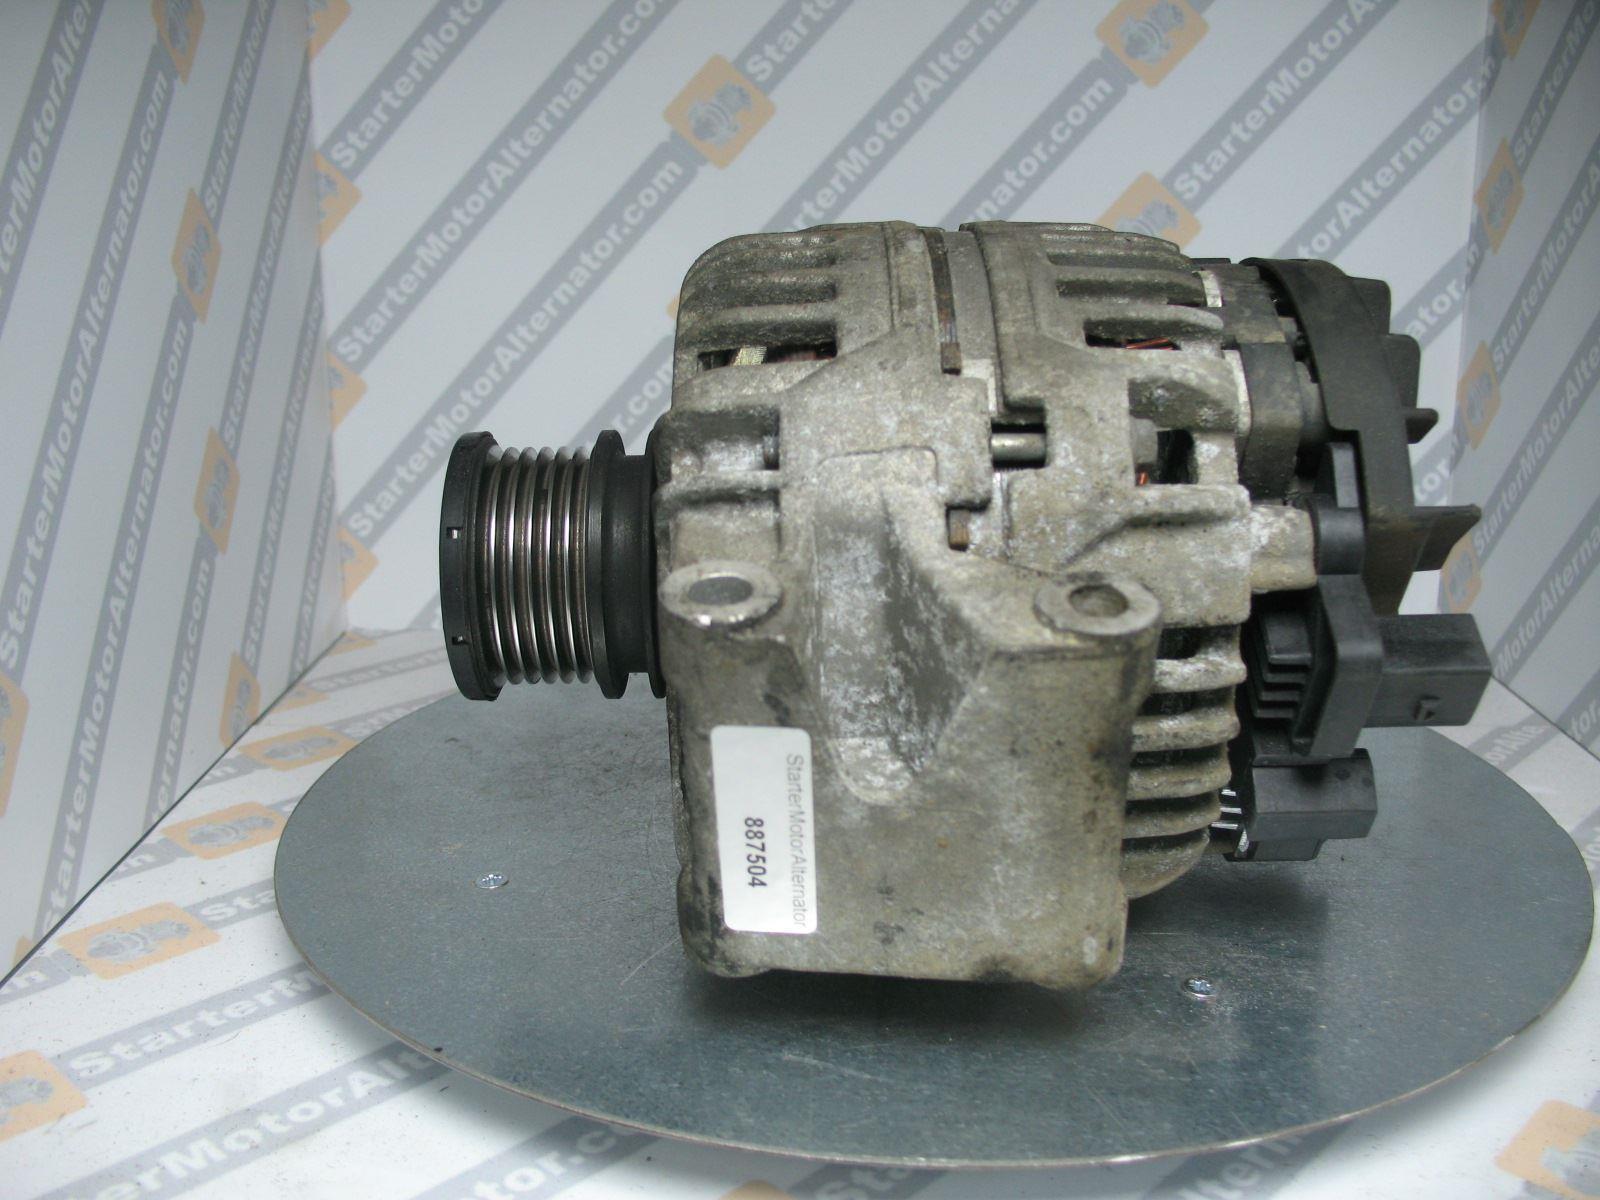 XIK3276 Alternator For Mercedes Benz